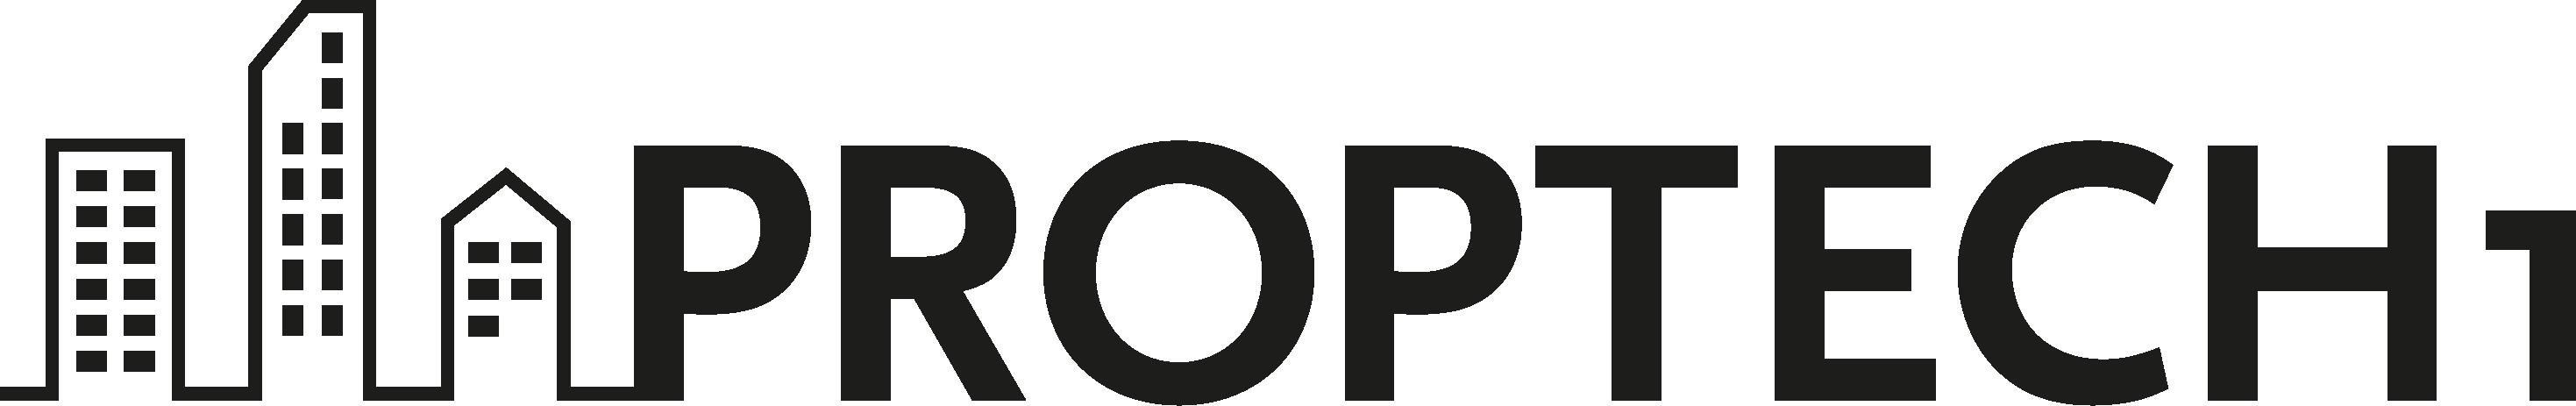 Praktikant (m/w/d) Venture Analyst_logo